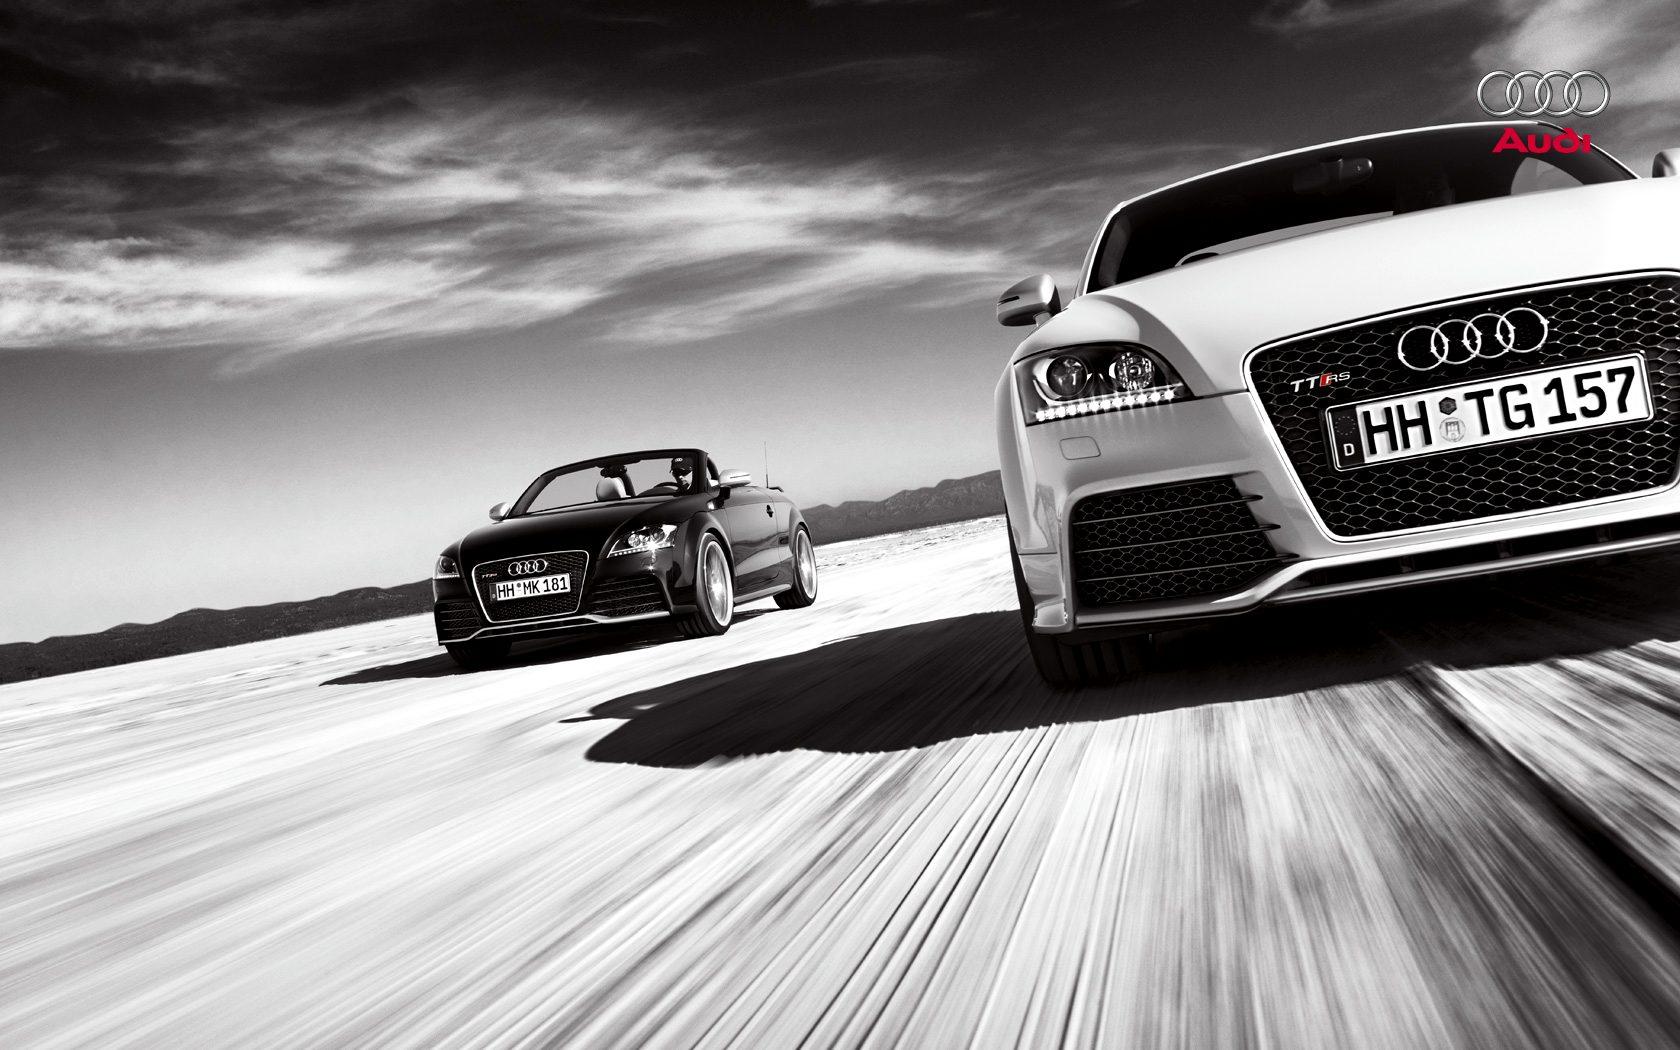 Audi TTRS Res: 1680x1050 / Size:251kb. Views: 25410